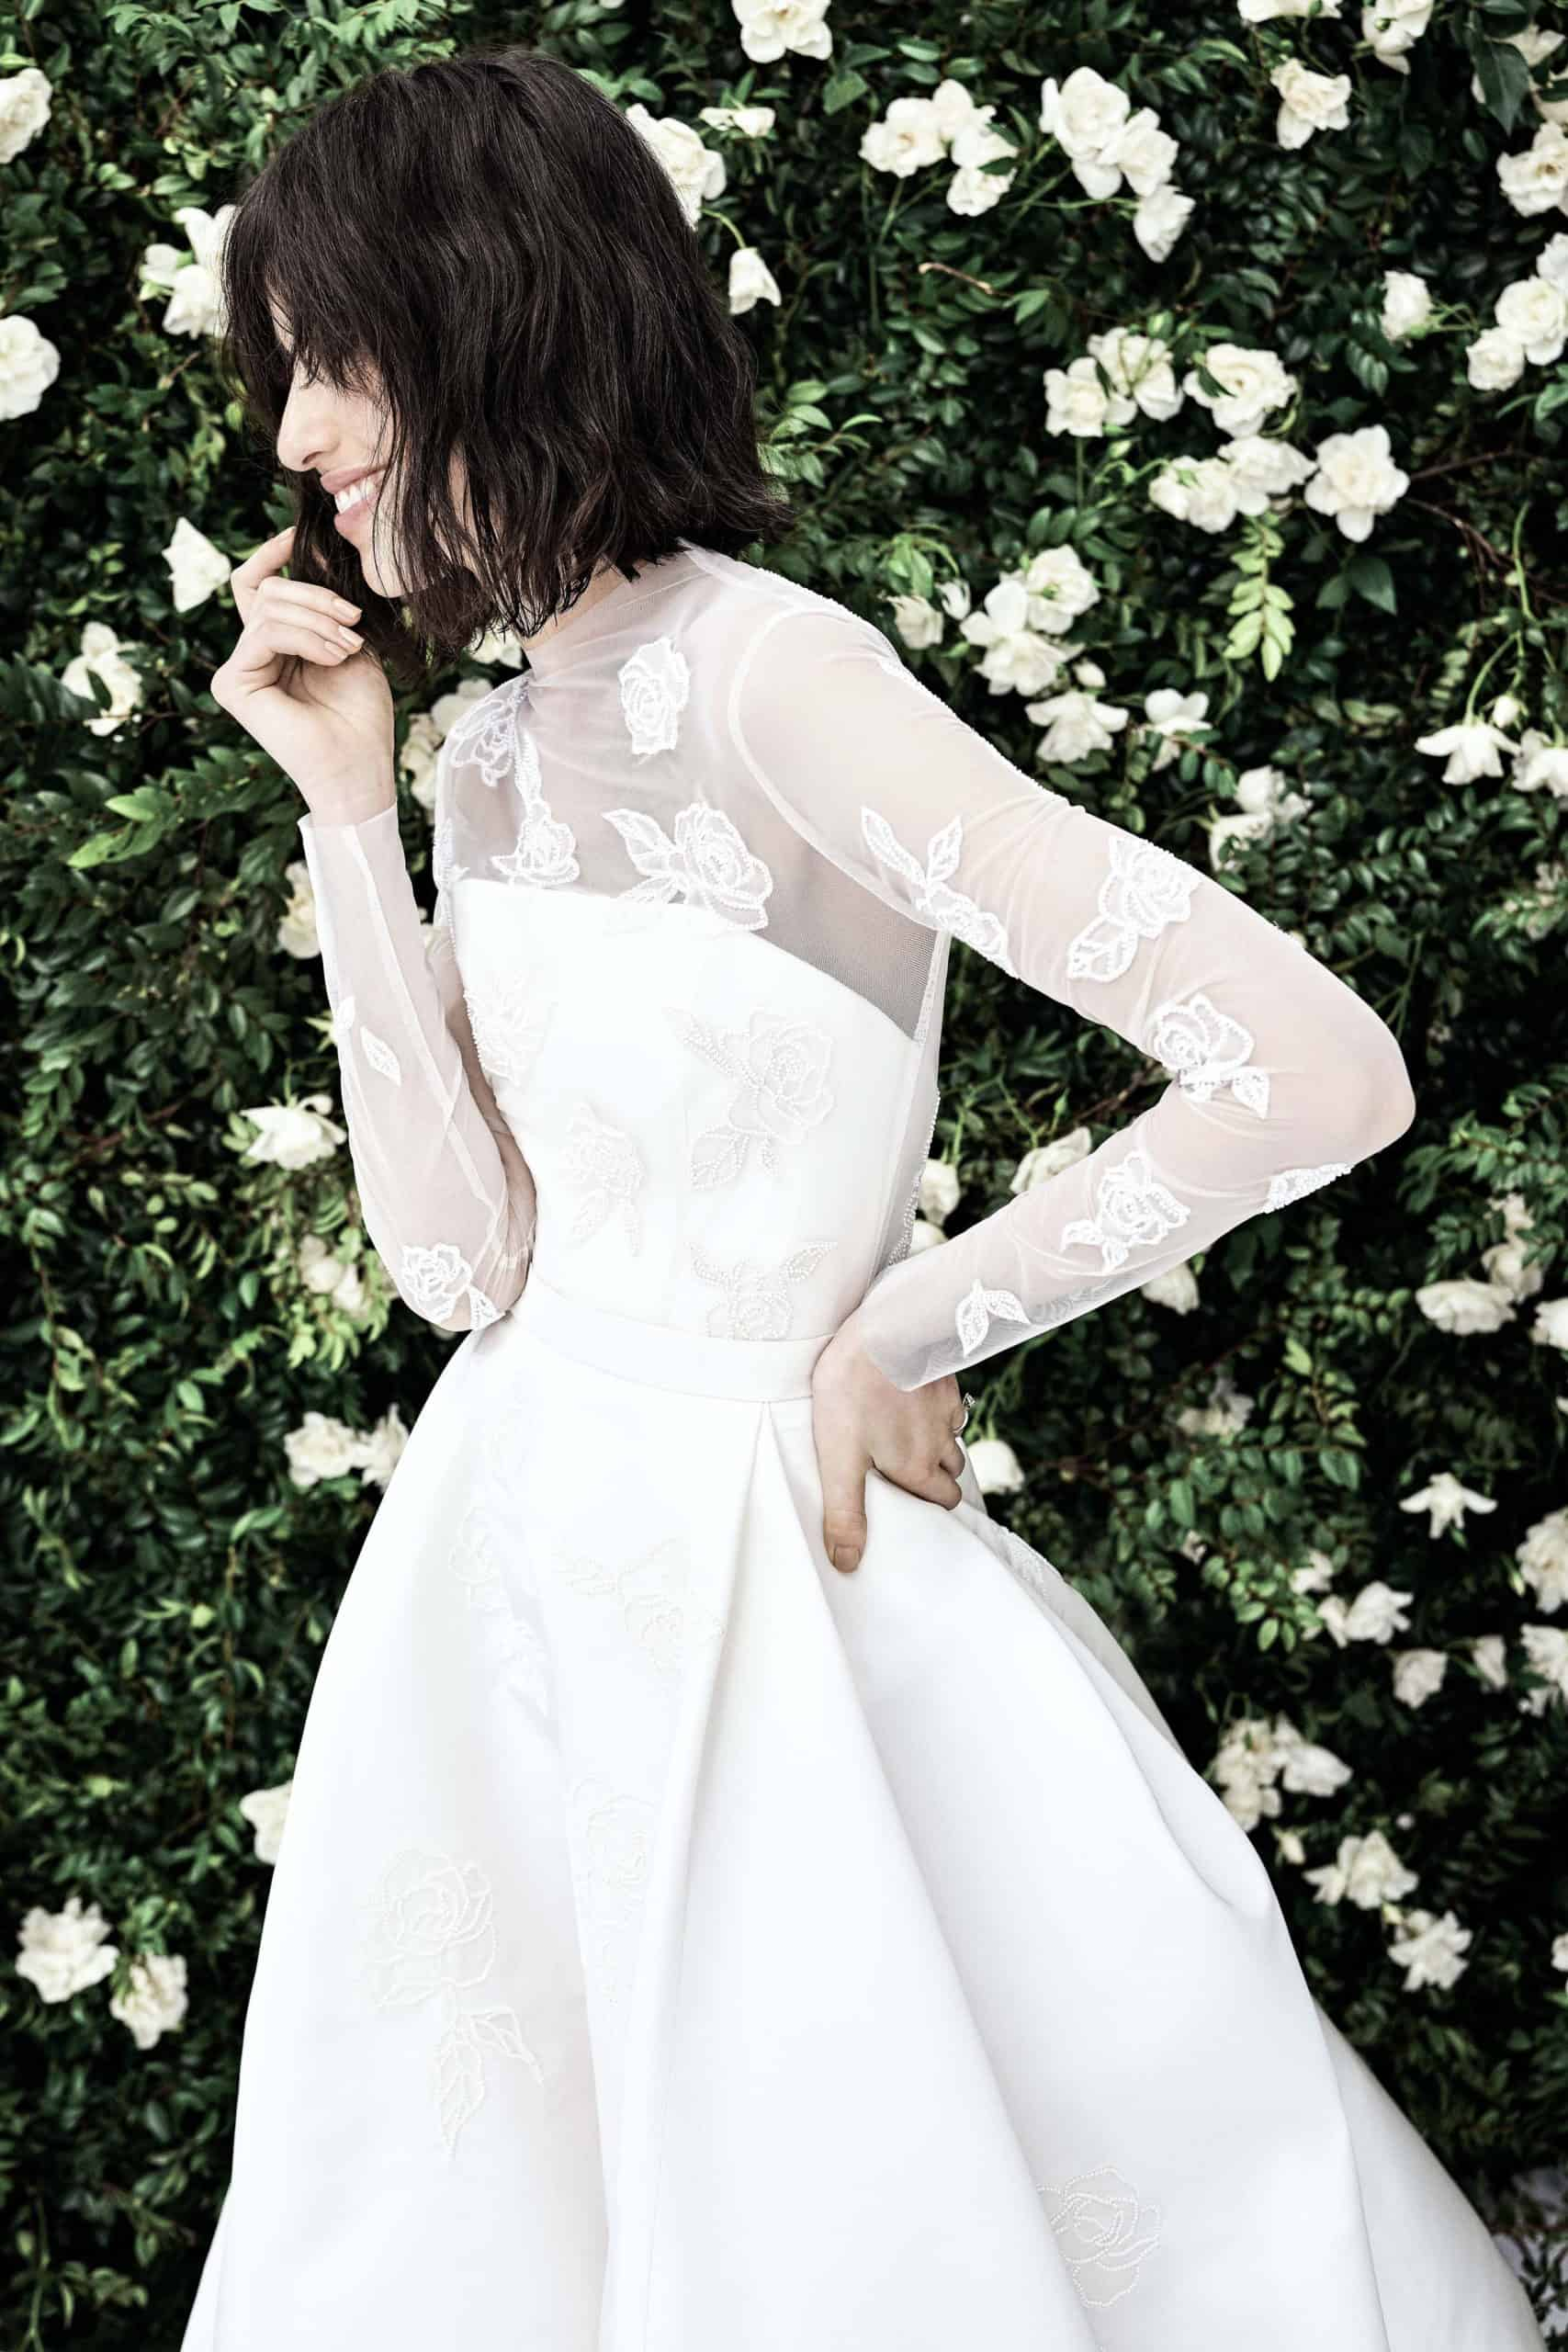 wedding dress with see-through sleeves by Carolina Herrera